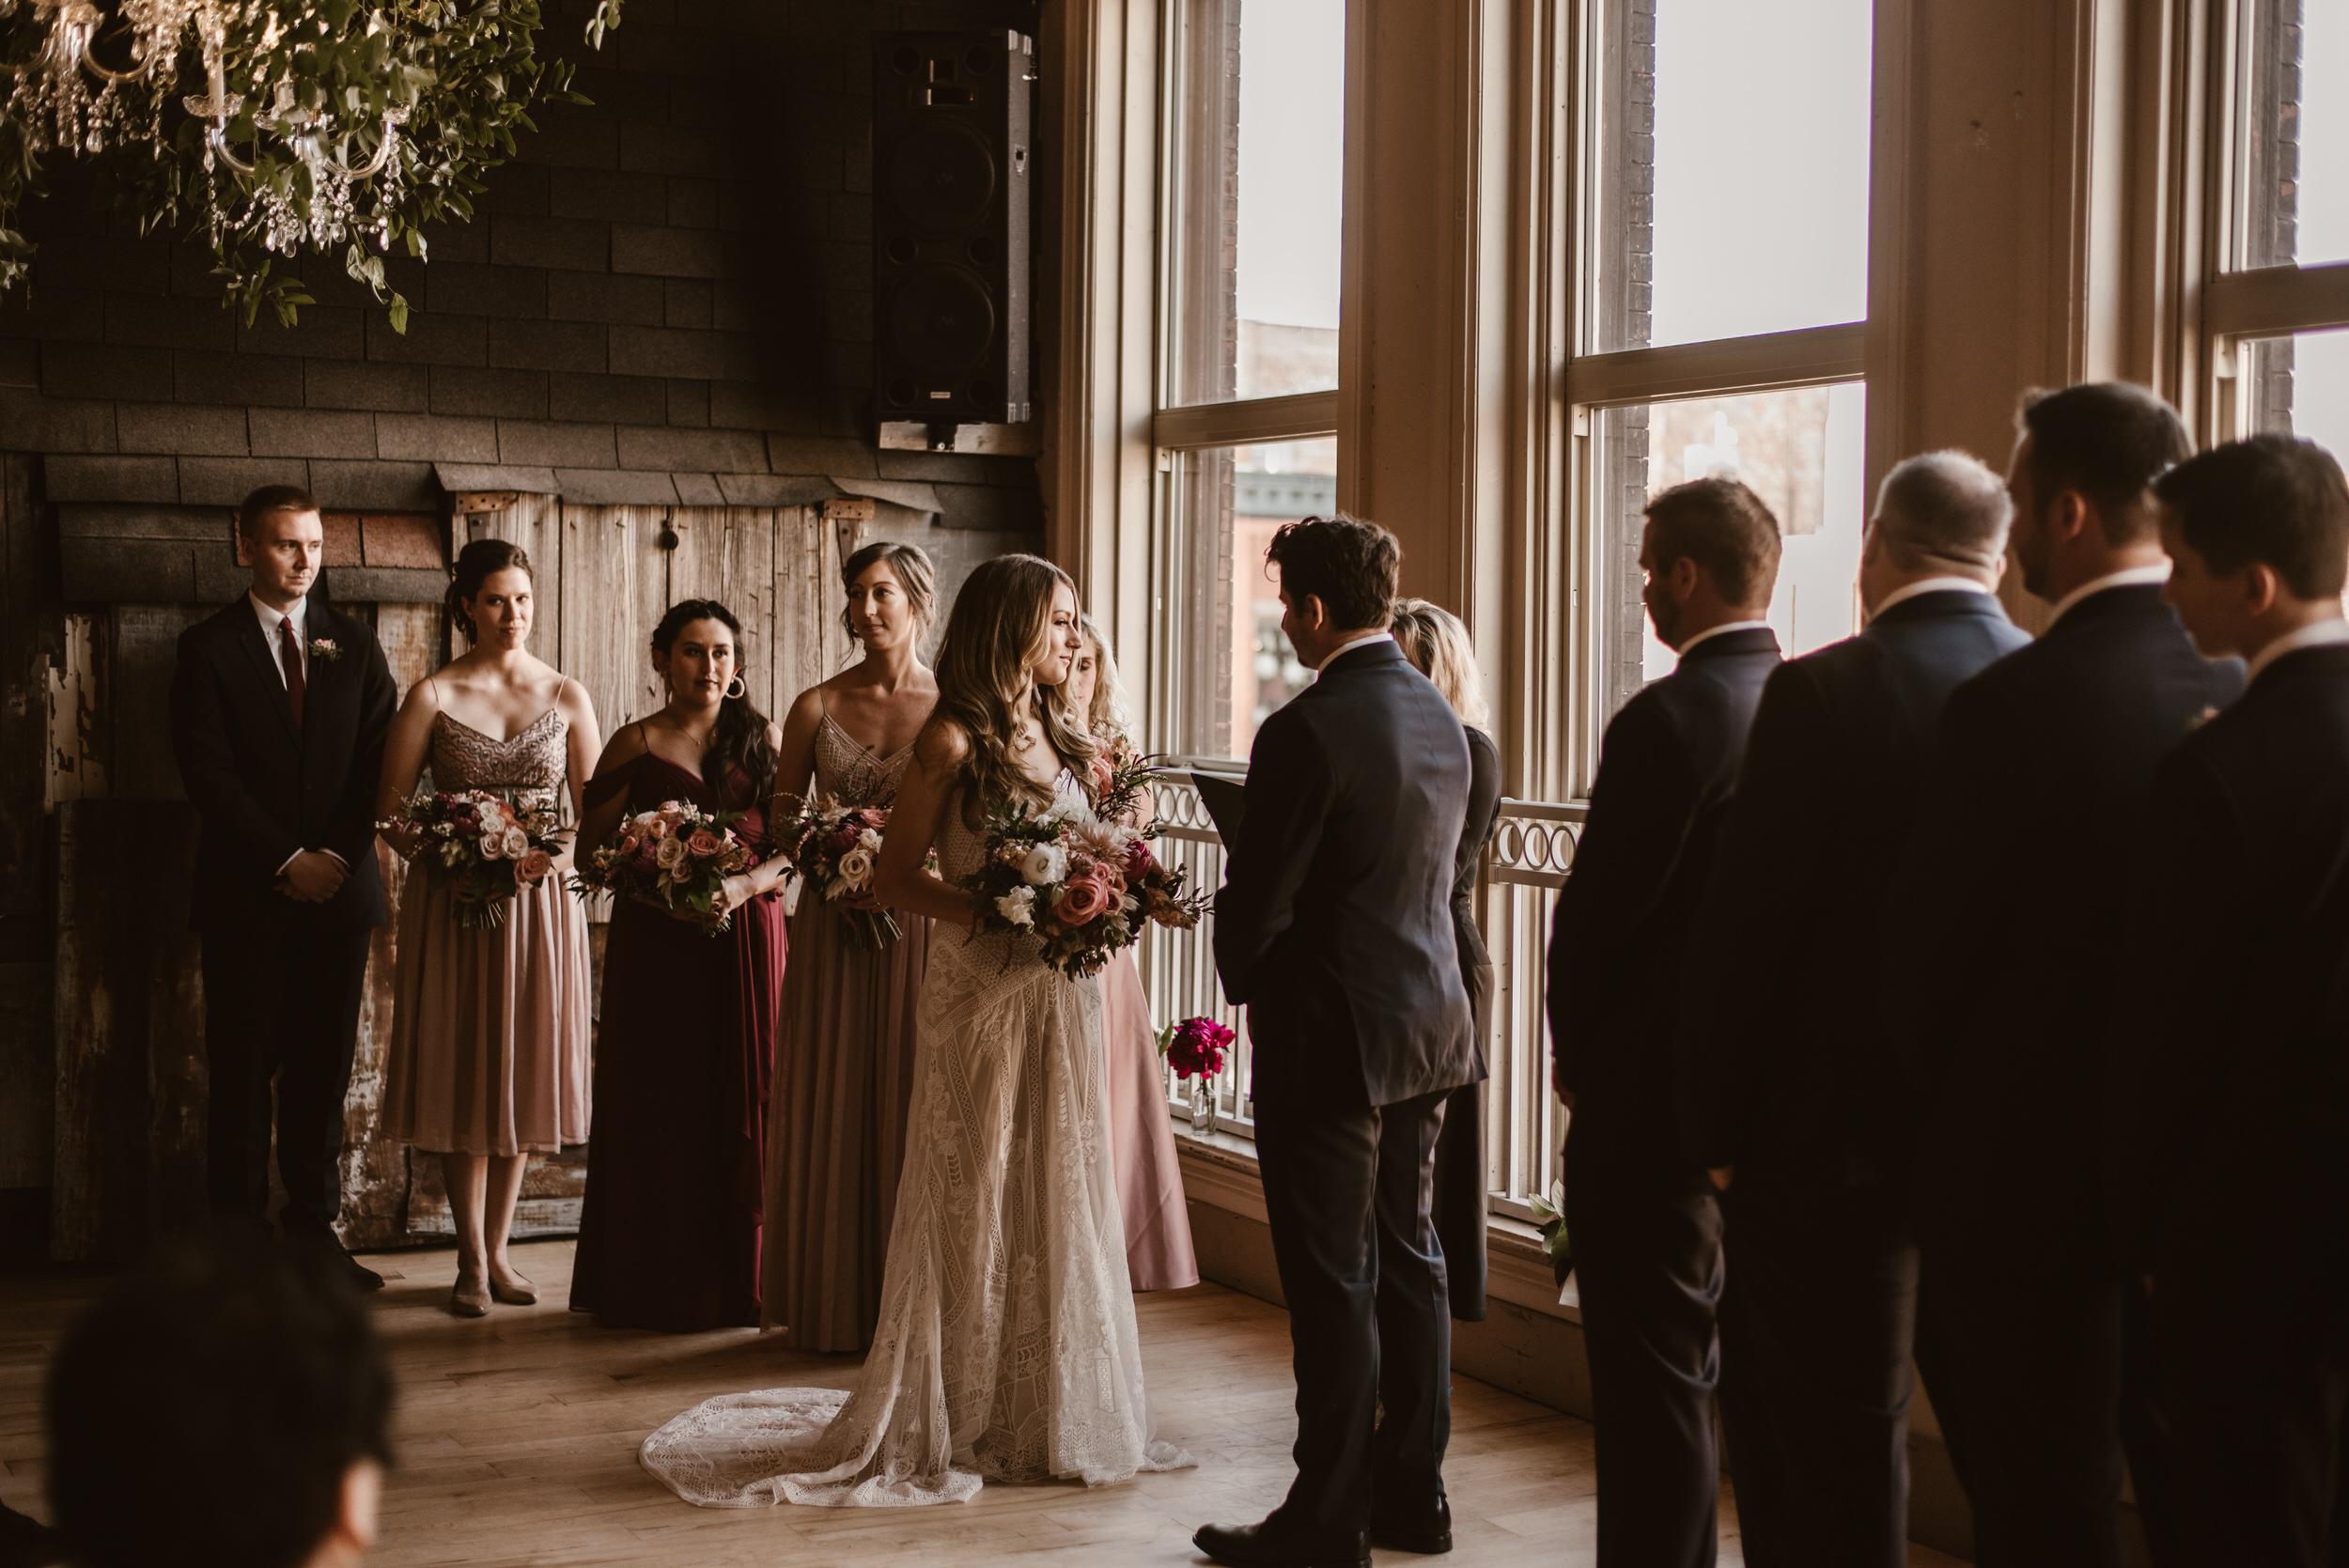 Stillwater-Minnesota-Wedding-Loft-at-Studio-J-Kaylie-Sirek-Photography-36.jpg